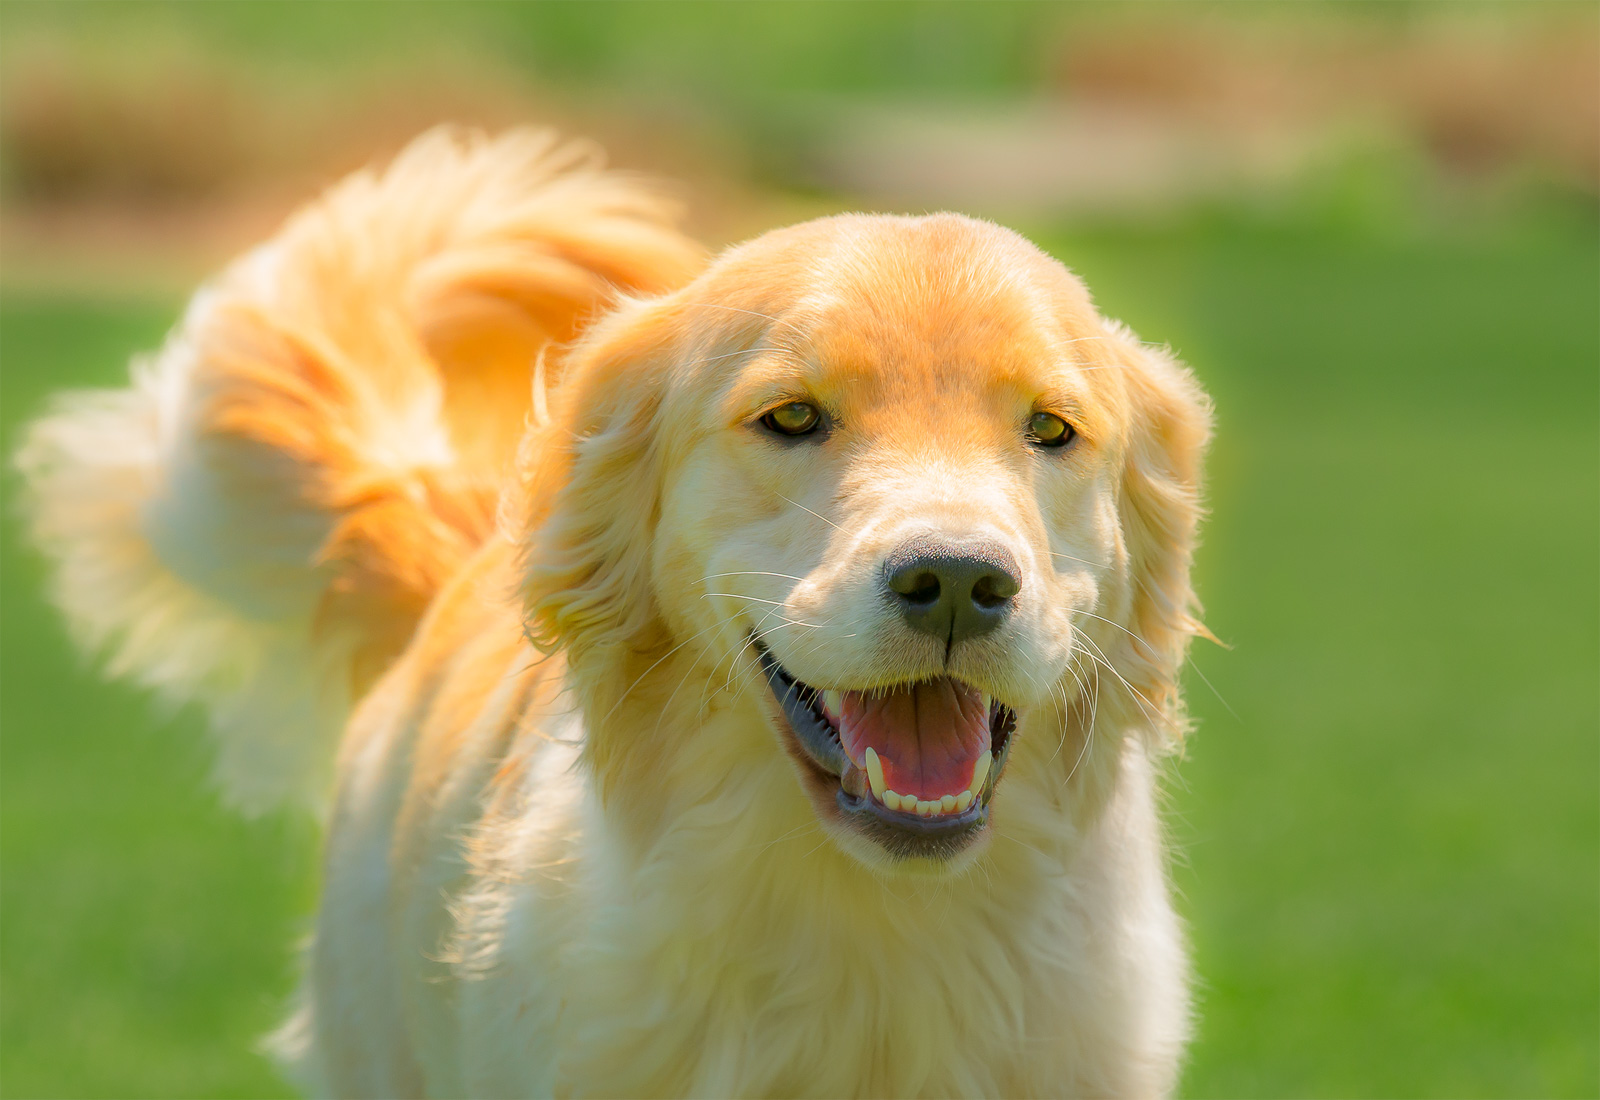 Golden Retriever smiling while prancing